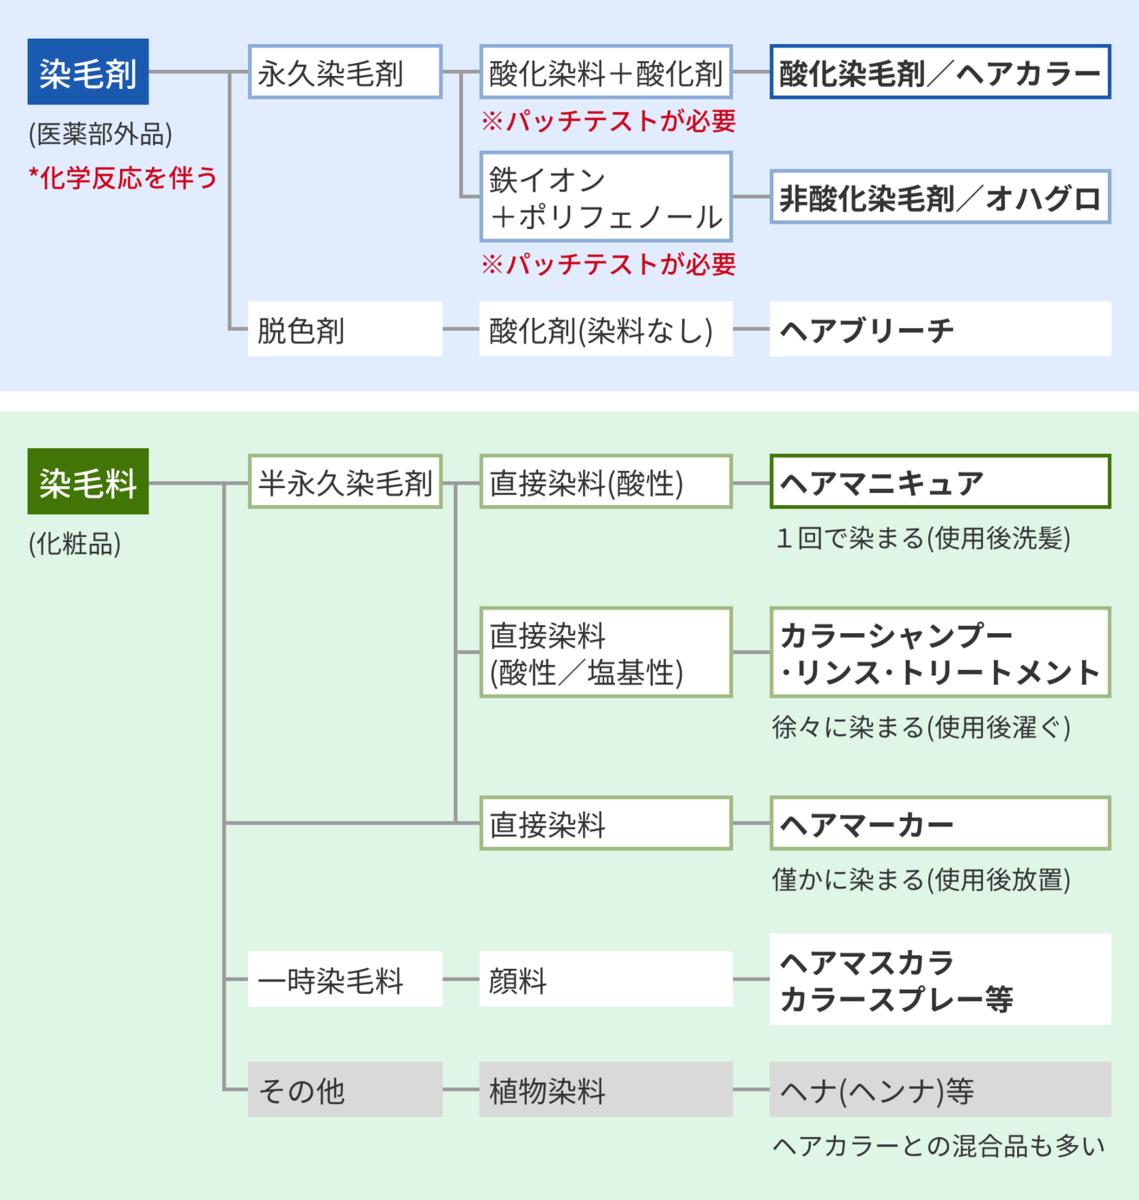 f:id:kei79:20210723171822p:plain